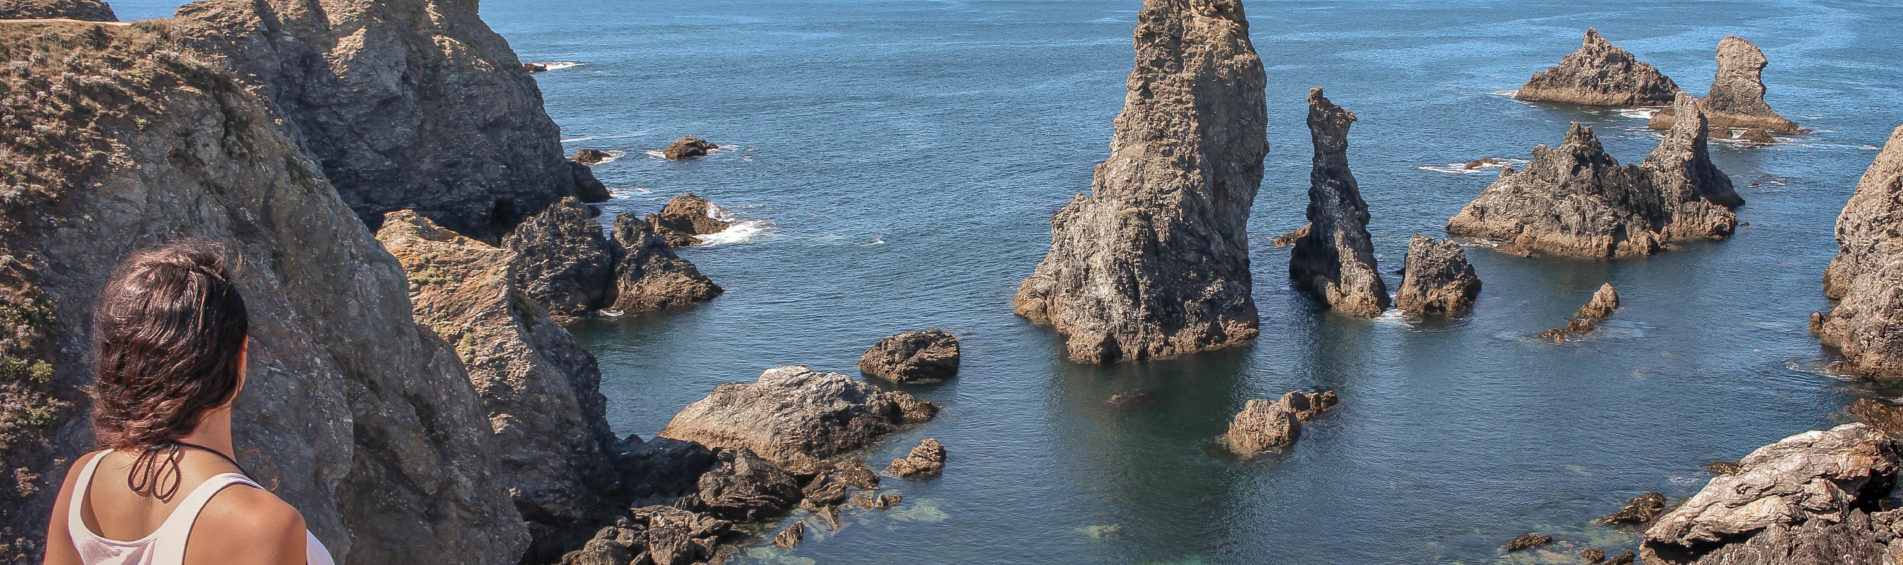 Belle-île-en-mer : Petit bijou du Morbihan